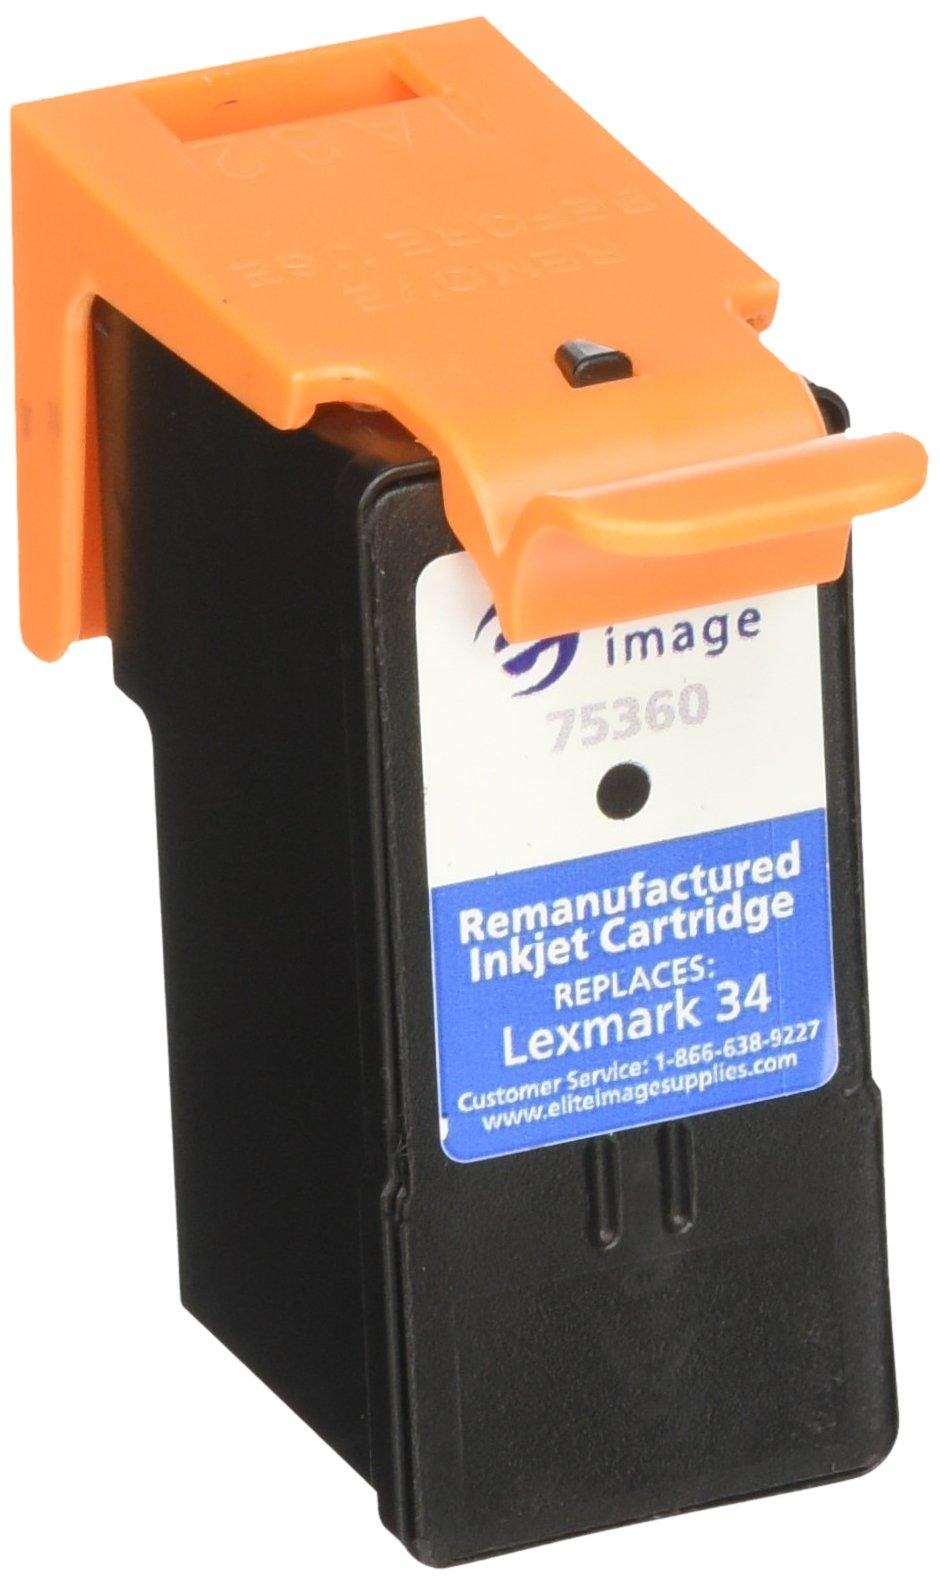 Elite Image ELI75360 75360 Ink Cartridge